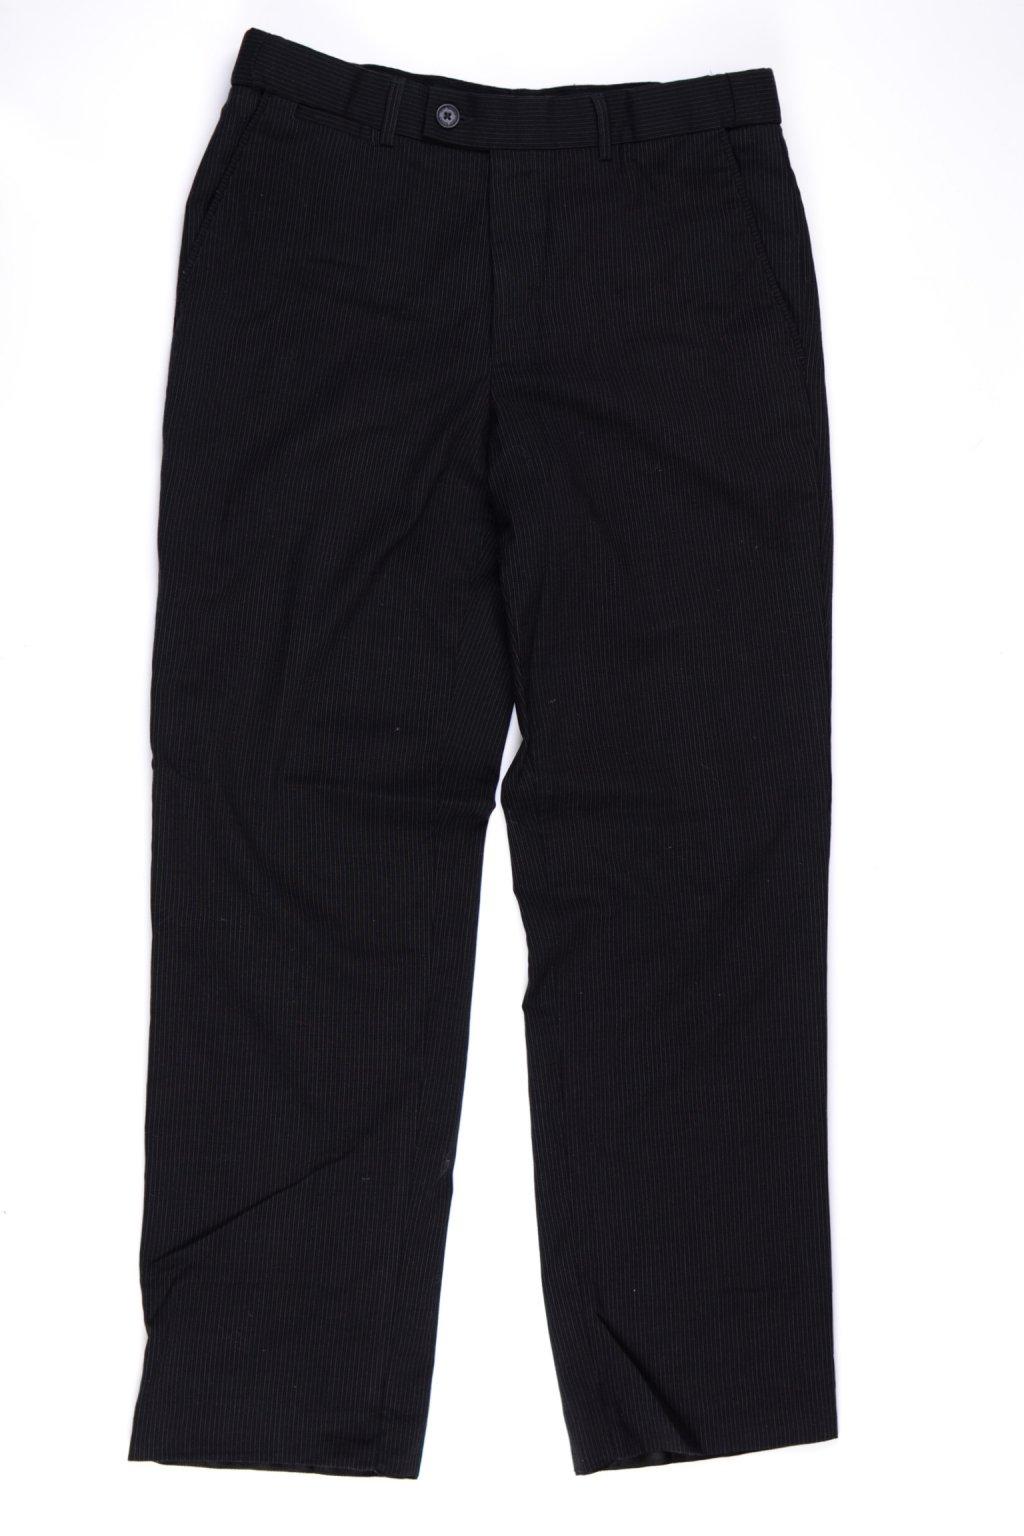 Kalhoty Debenhams vel 34R/ vel M pánské